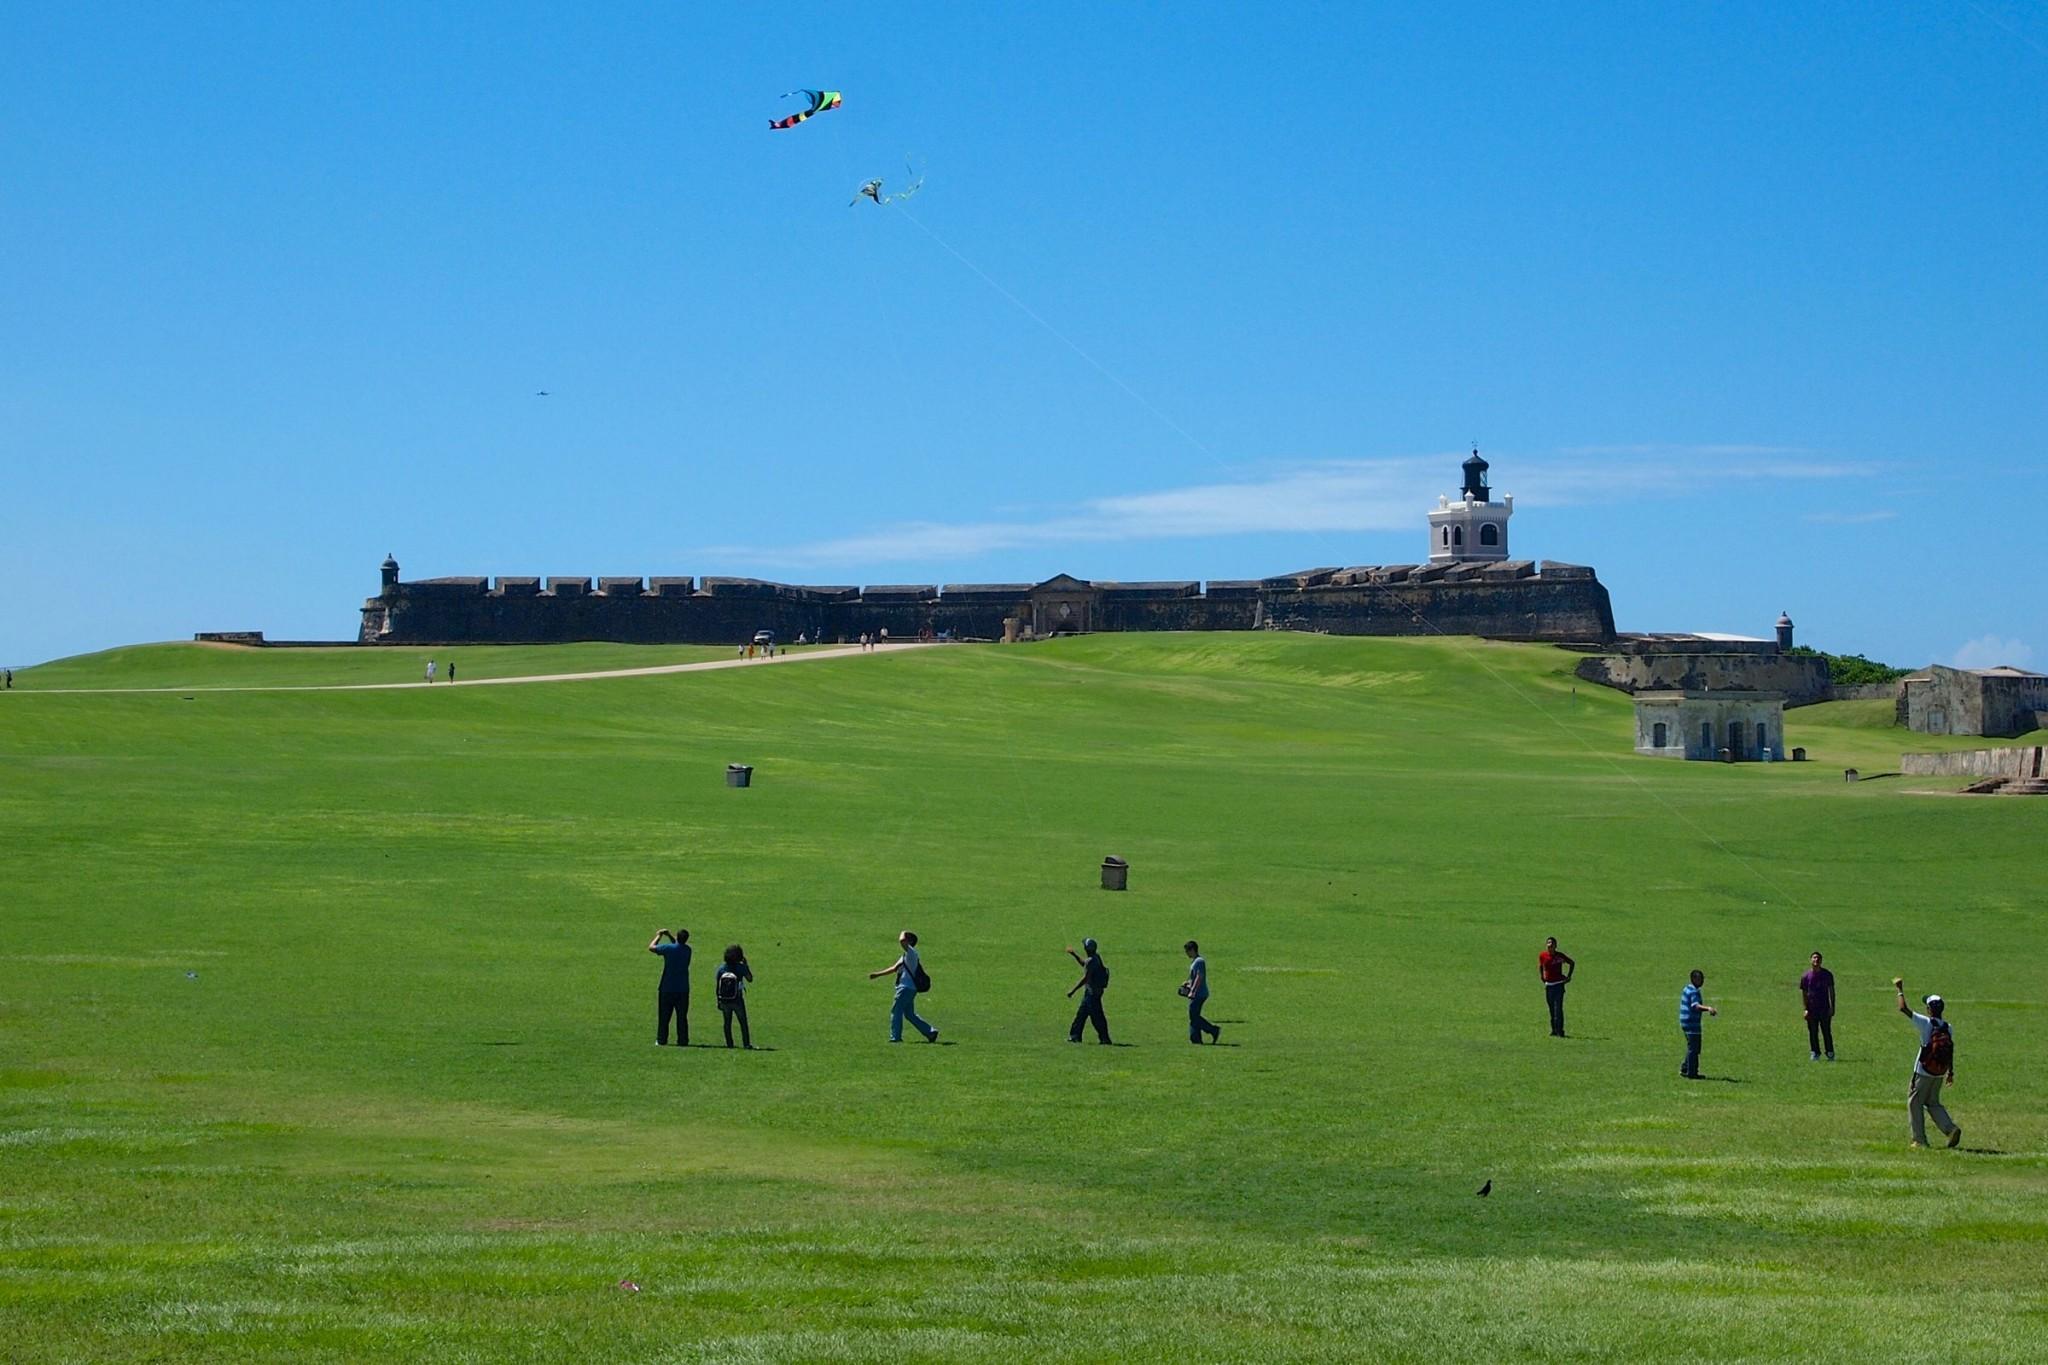 Kite-Flying Fun on El Morro Esplanade: Photo of the Day